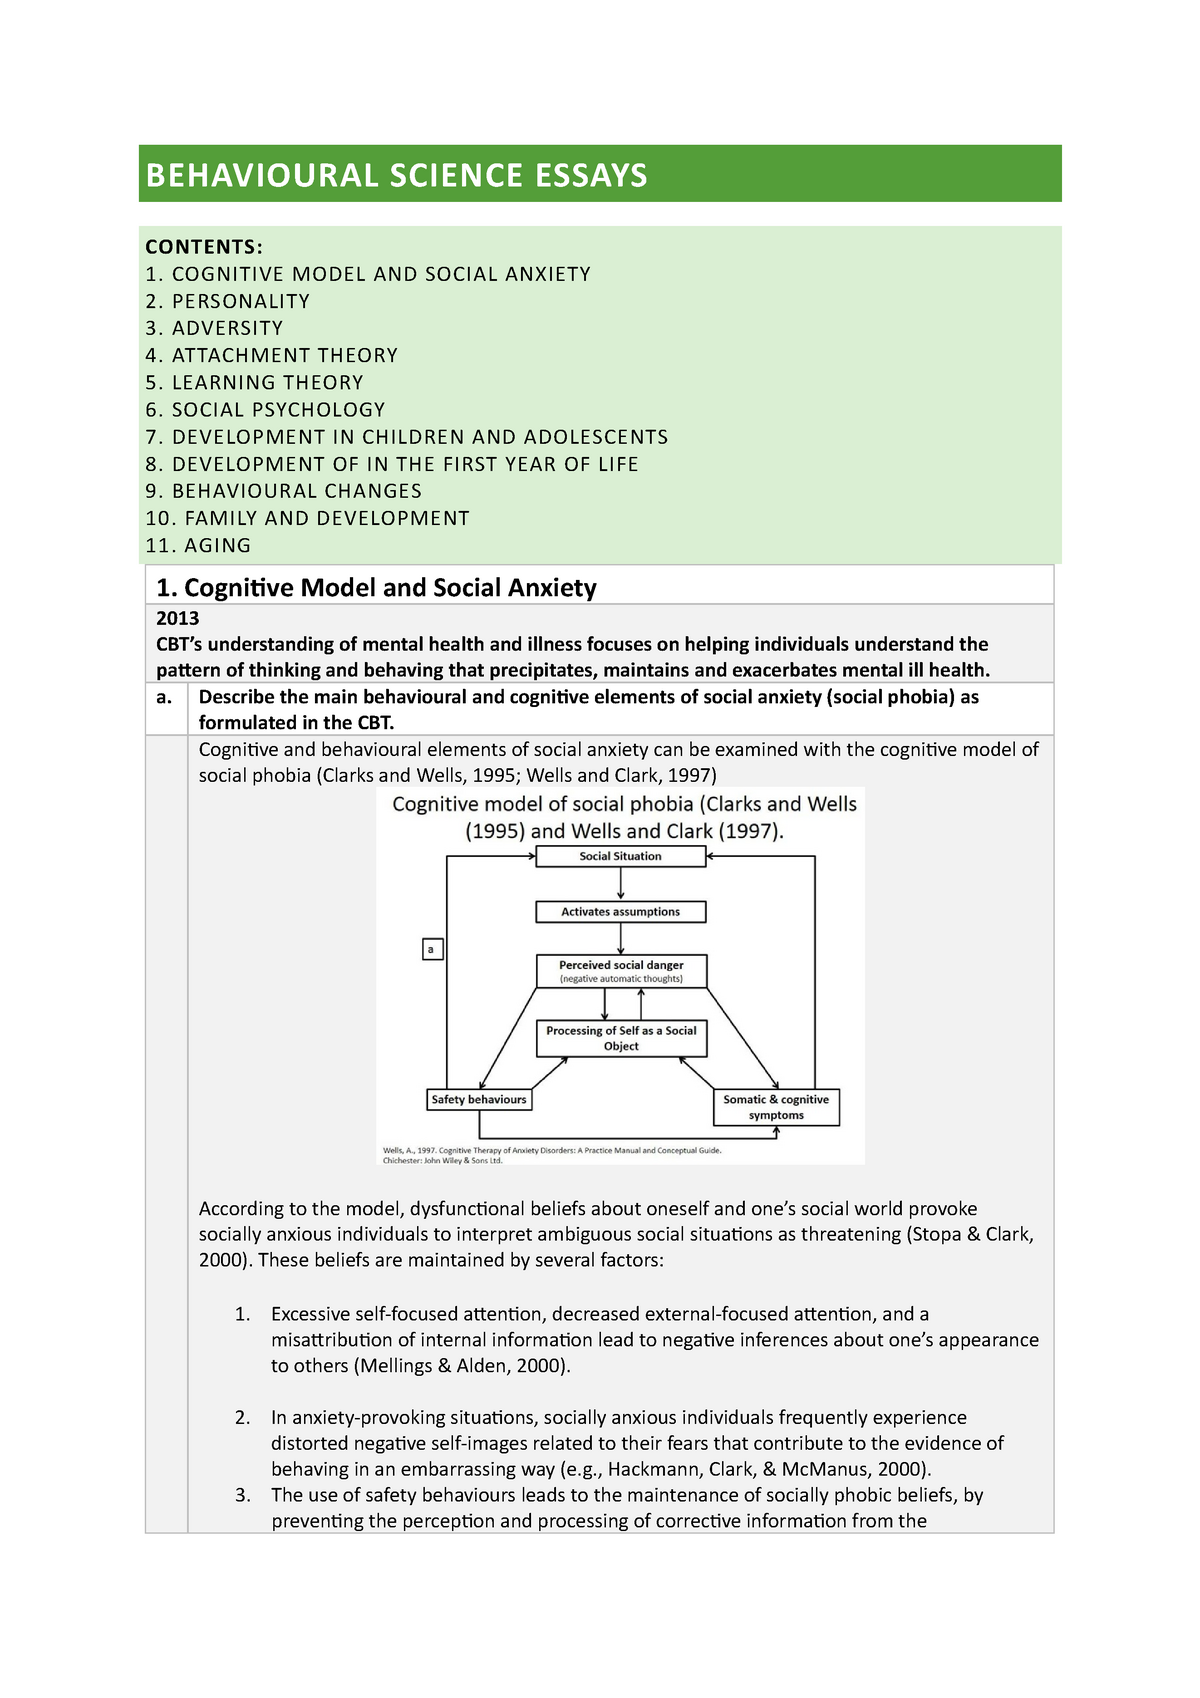 Behavioral science essay topics article editing service usa